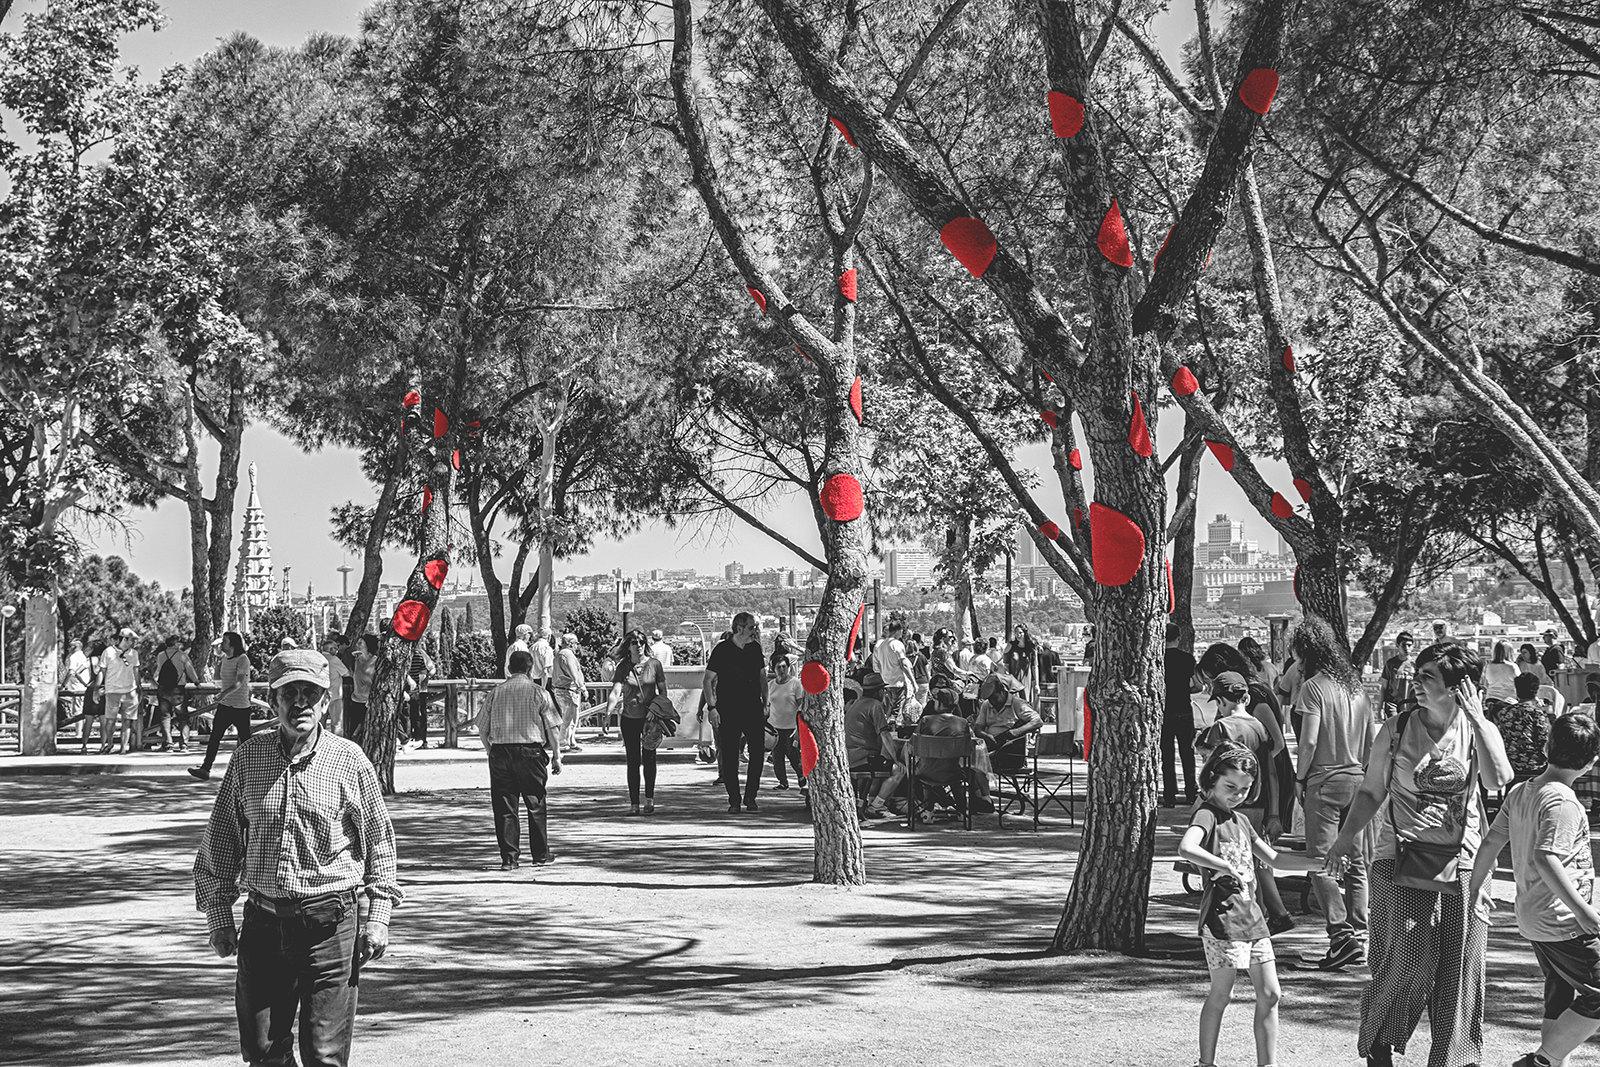 Fiestas San Isidro '19